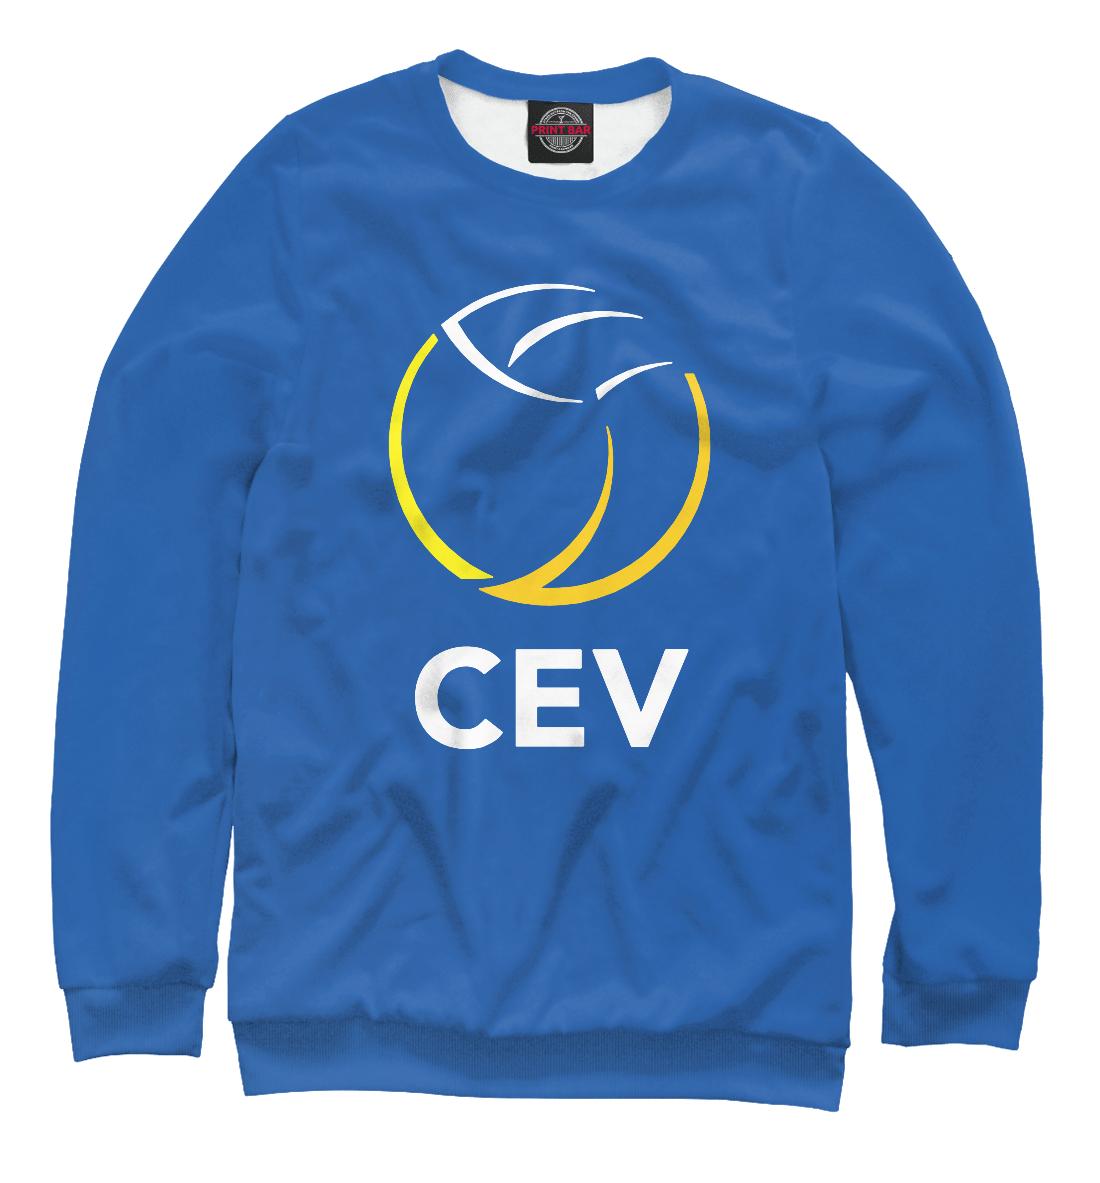 Купить Volleyball CEV (European Volleyball Confederation), Printbar, Свитшоты, VLB-751765-swi-2